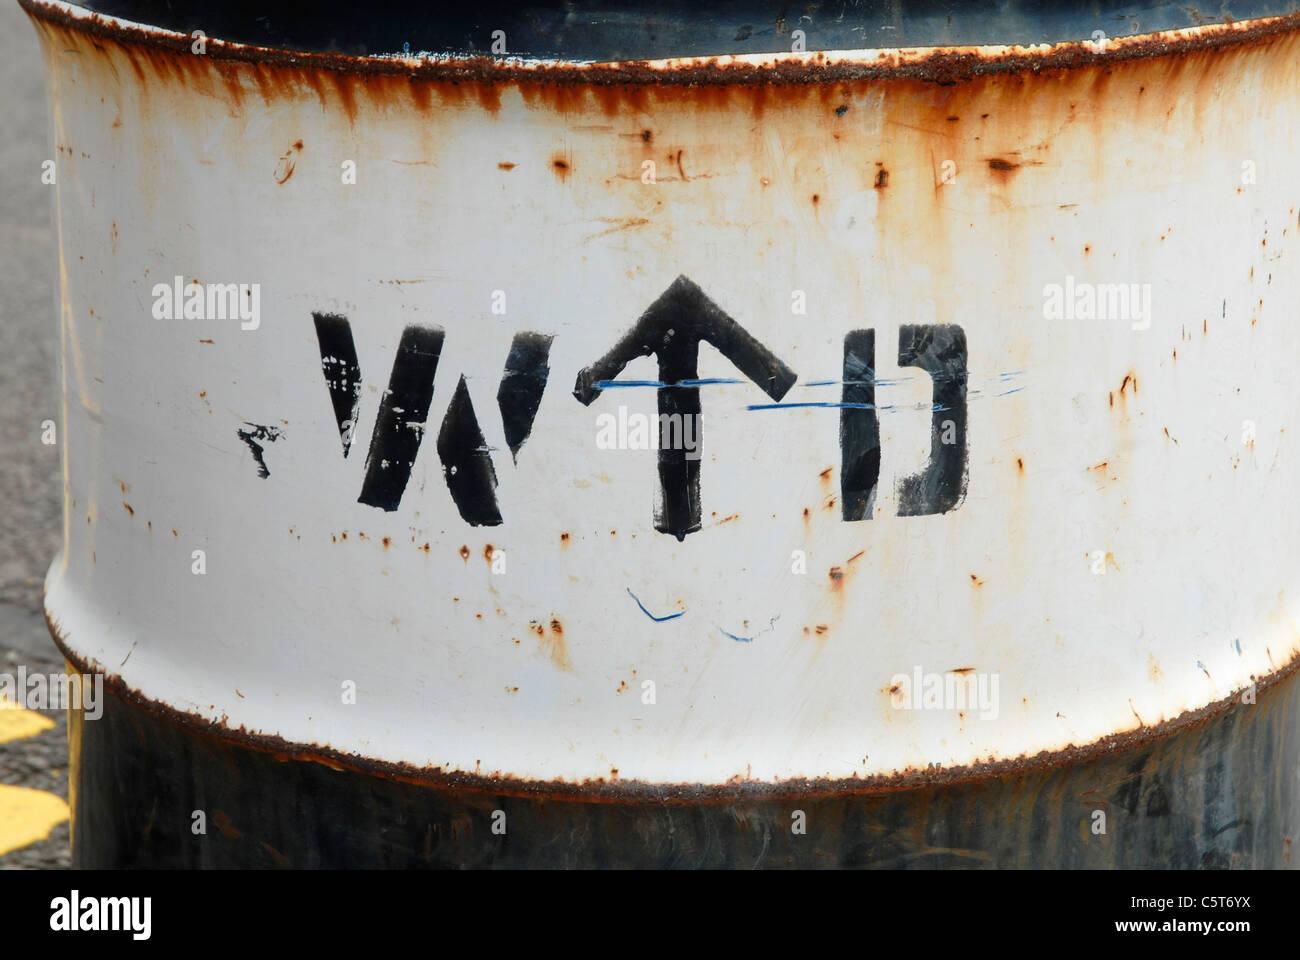 Disused former war dept oildrum marker post outside codebreaker huts at Bletchley Park, Bucks., 2011. - Stock Image